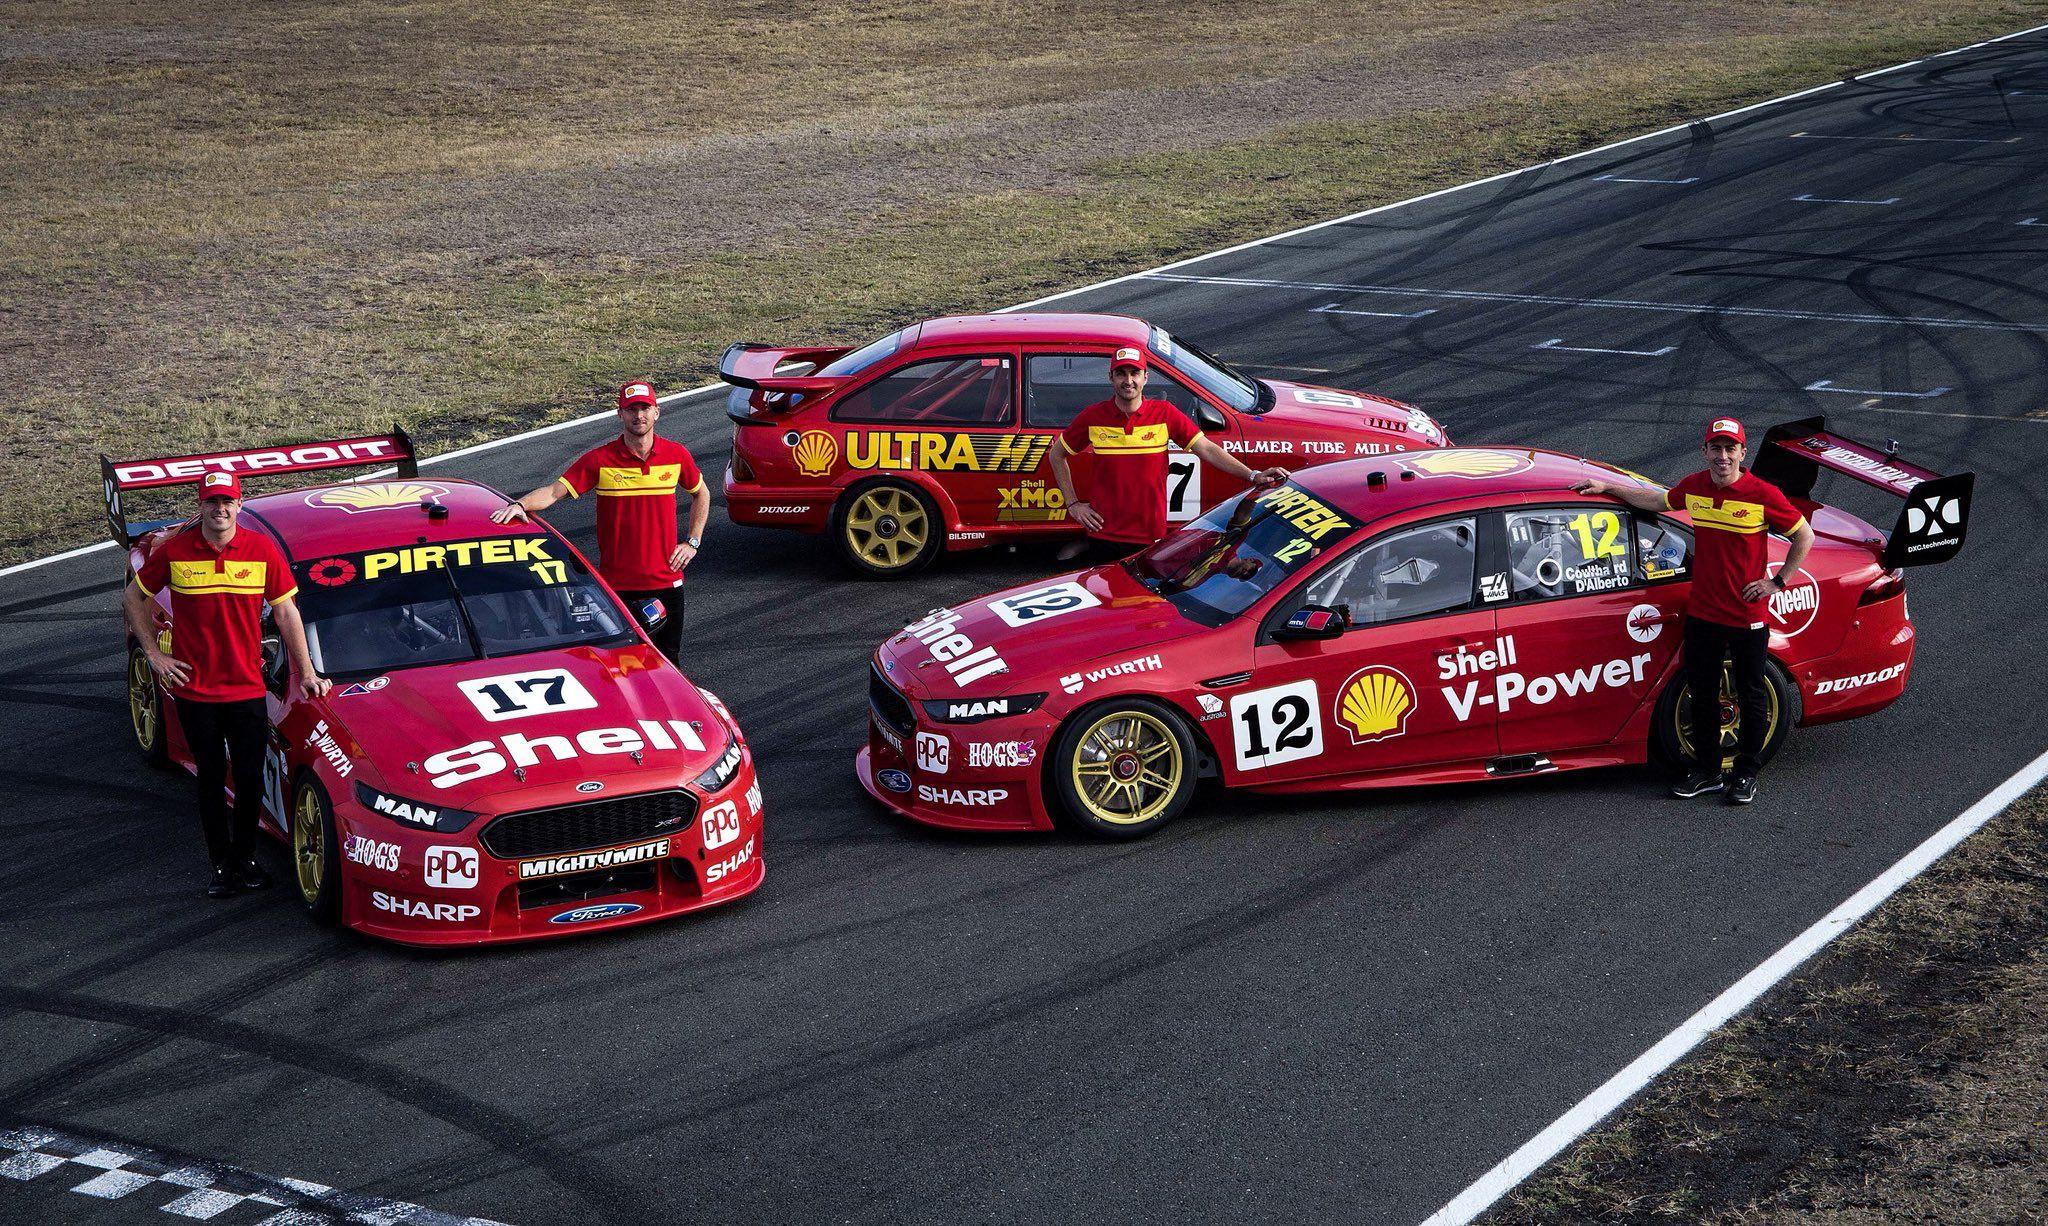 Pin By Leland Bostick On V8 Supercars Super Cars V8 Supercars Australia Australian Cars